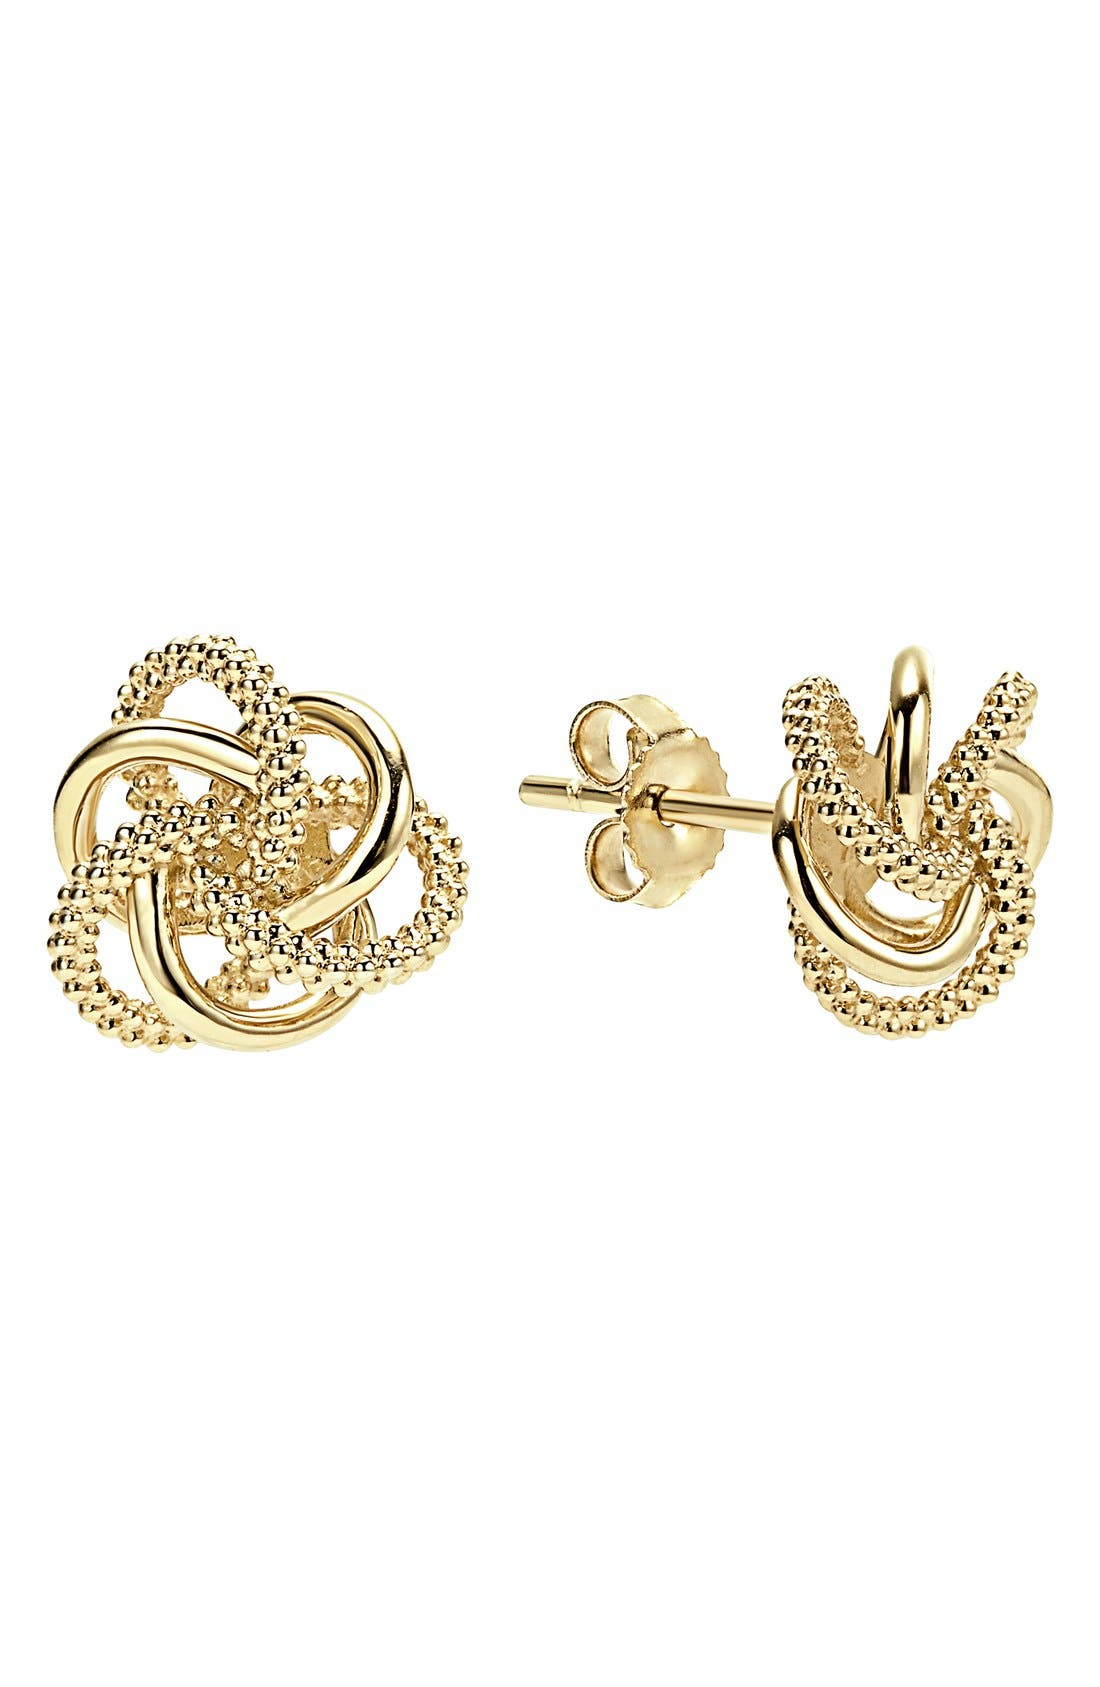 Alternate Image 1 Selected - LAGOS 'Love Knot' 18k Gold Stud Earrings